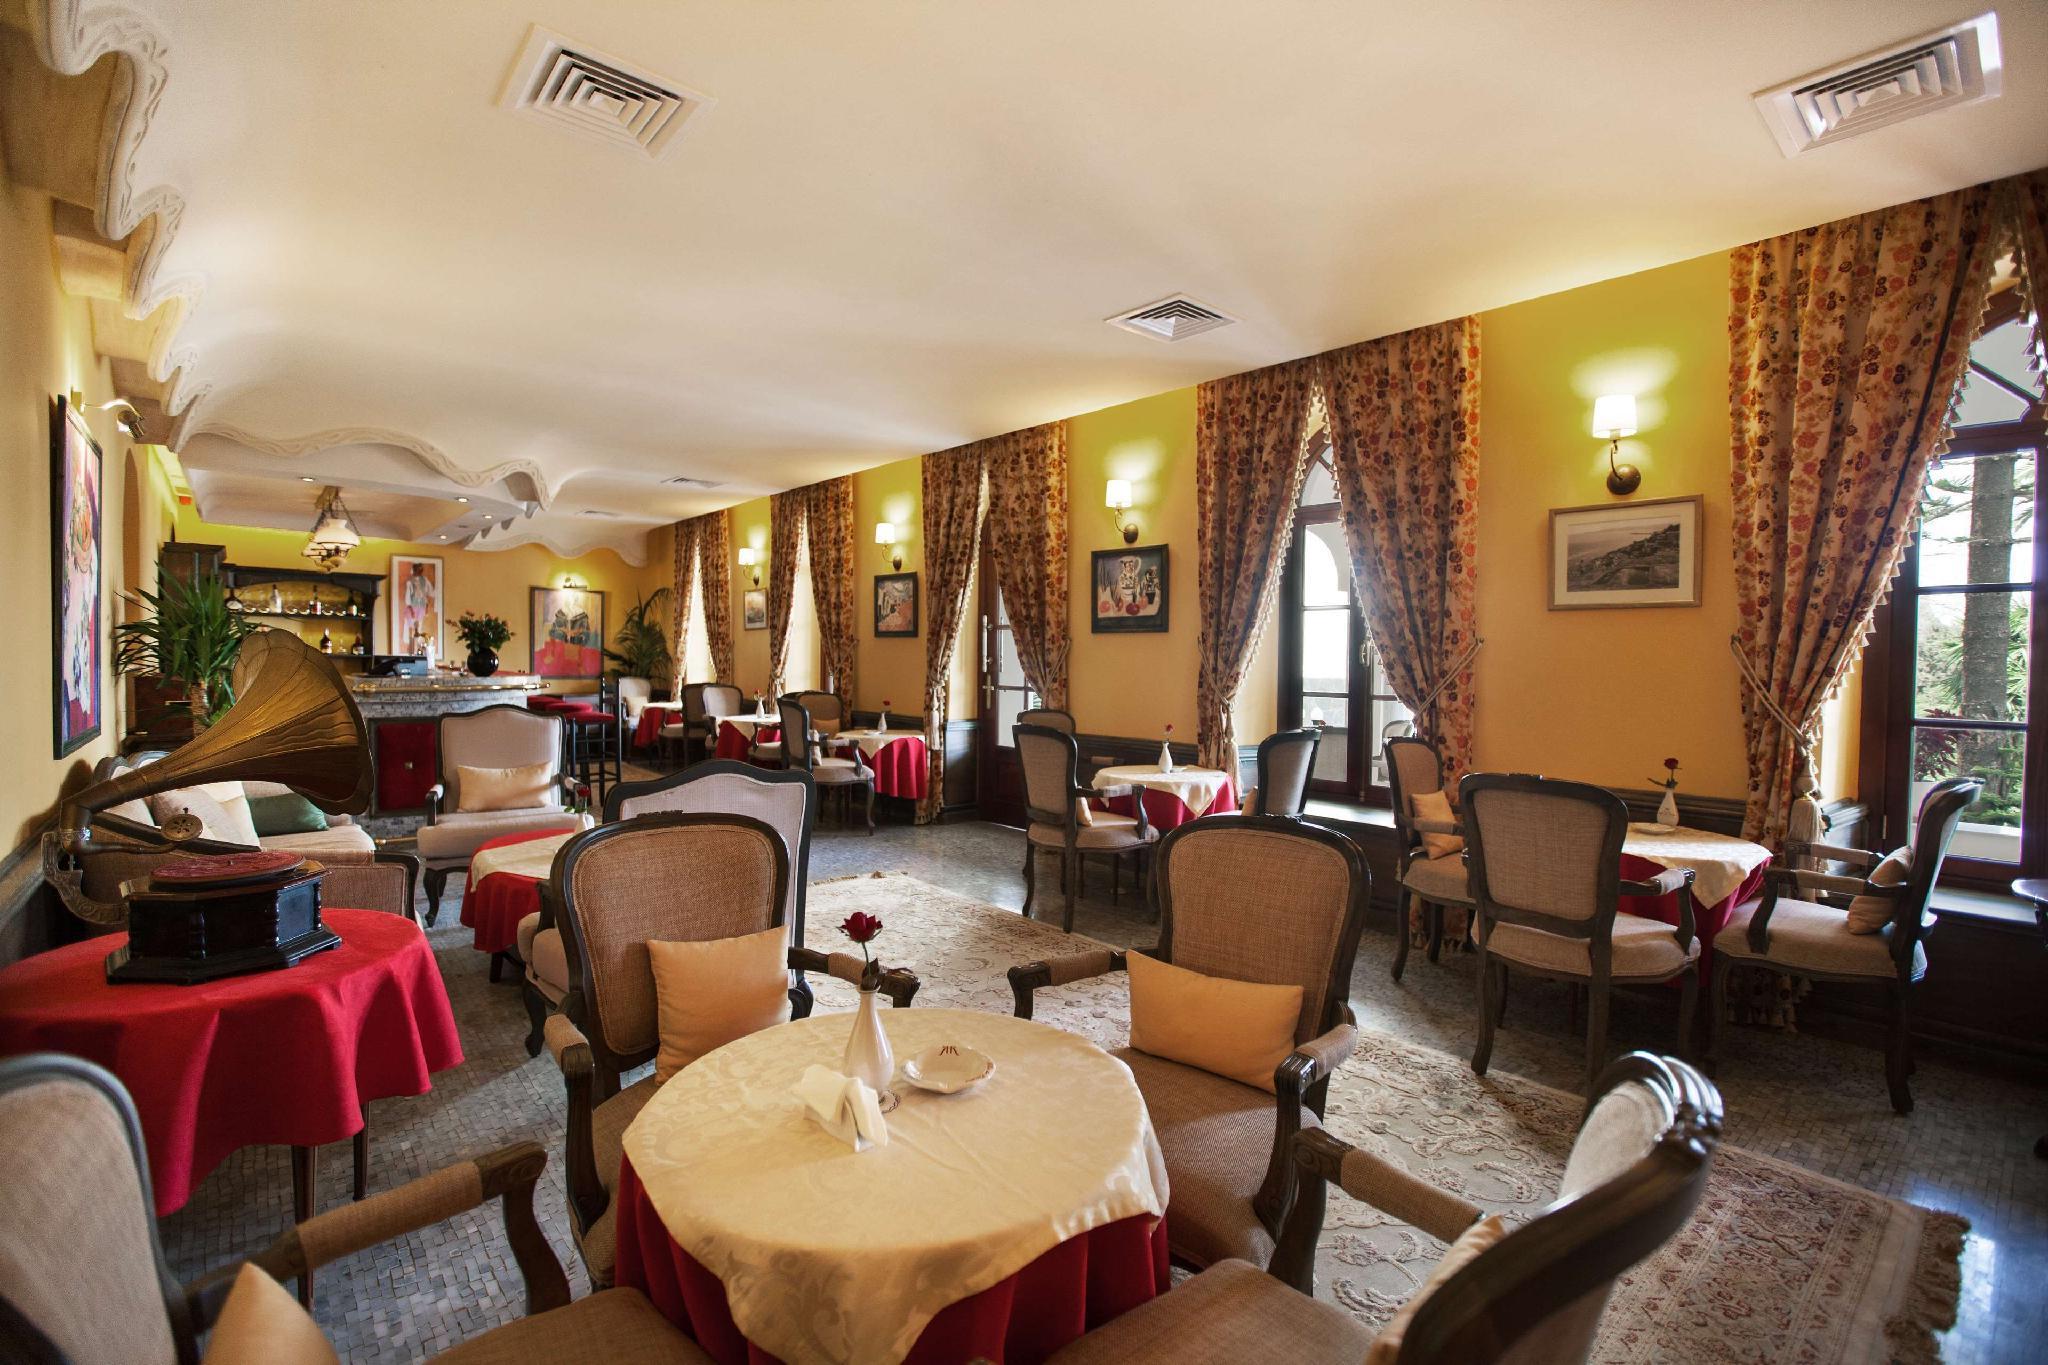 Grand Hotel Villa de France, Tanger-Assilah